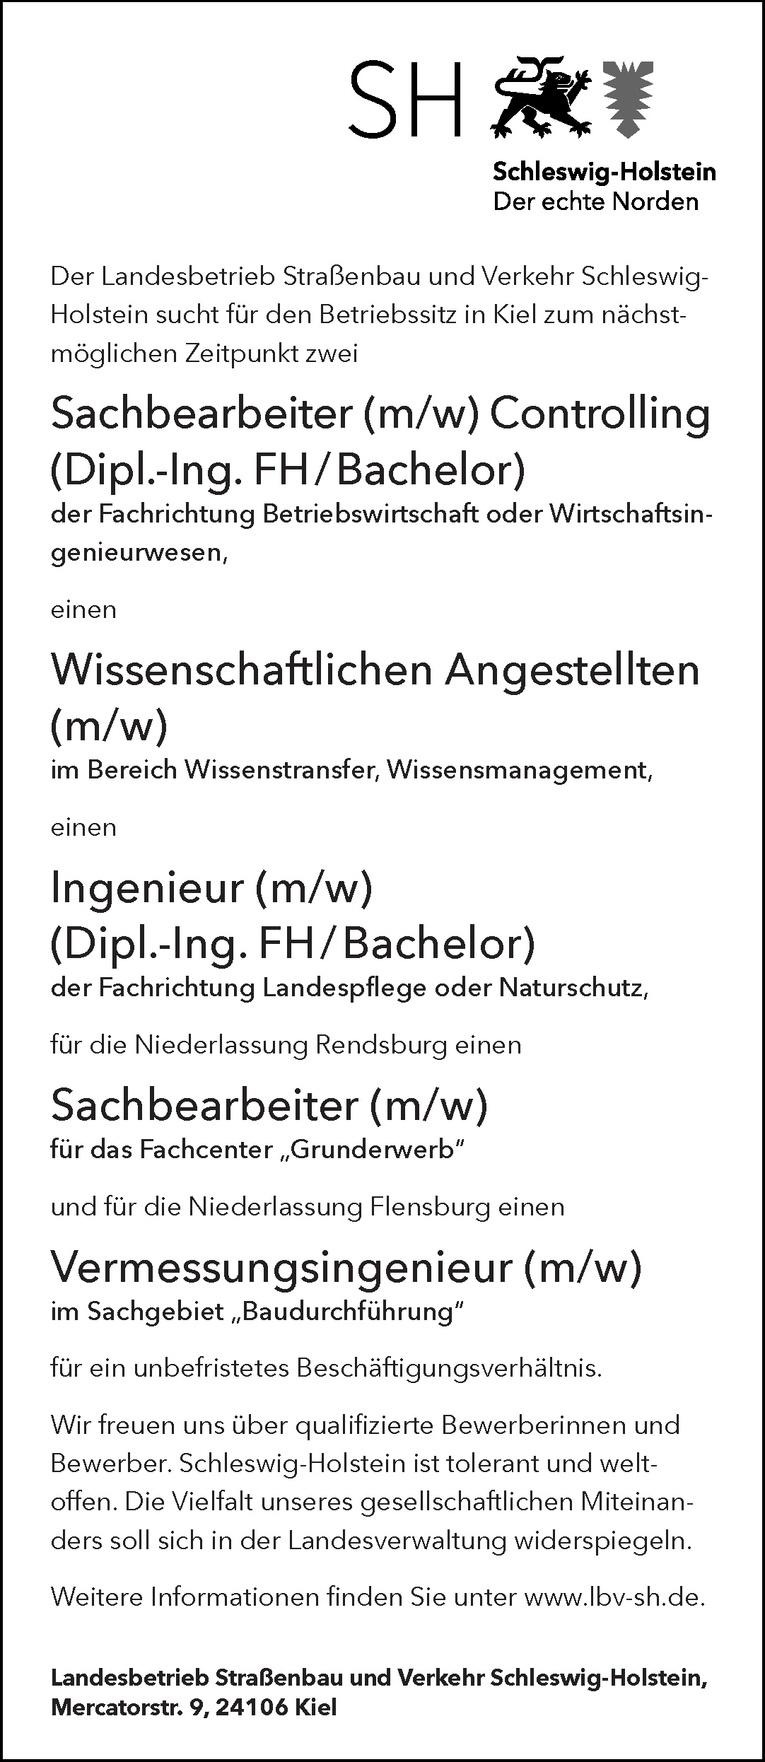 Sachbearbeiter (m/w) Controlling